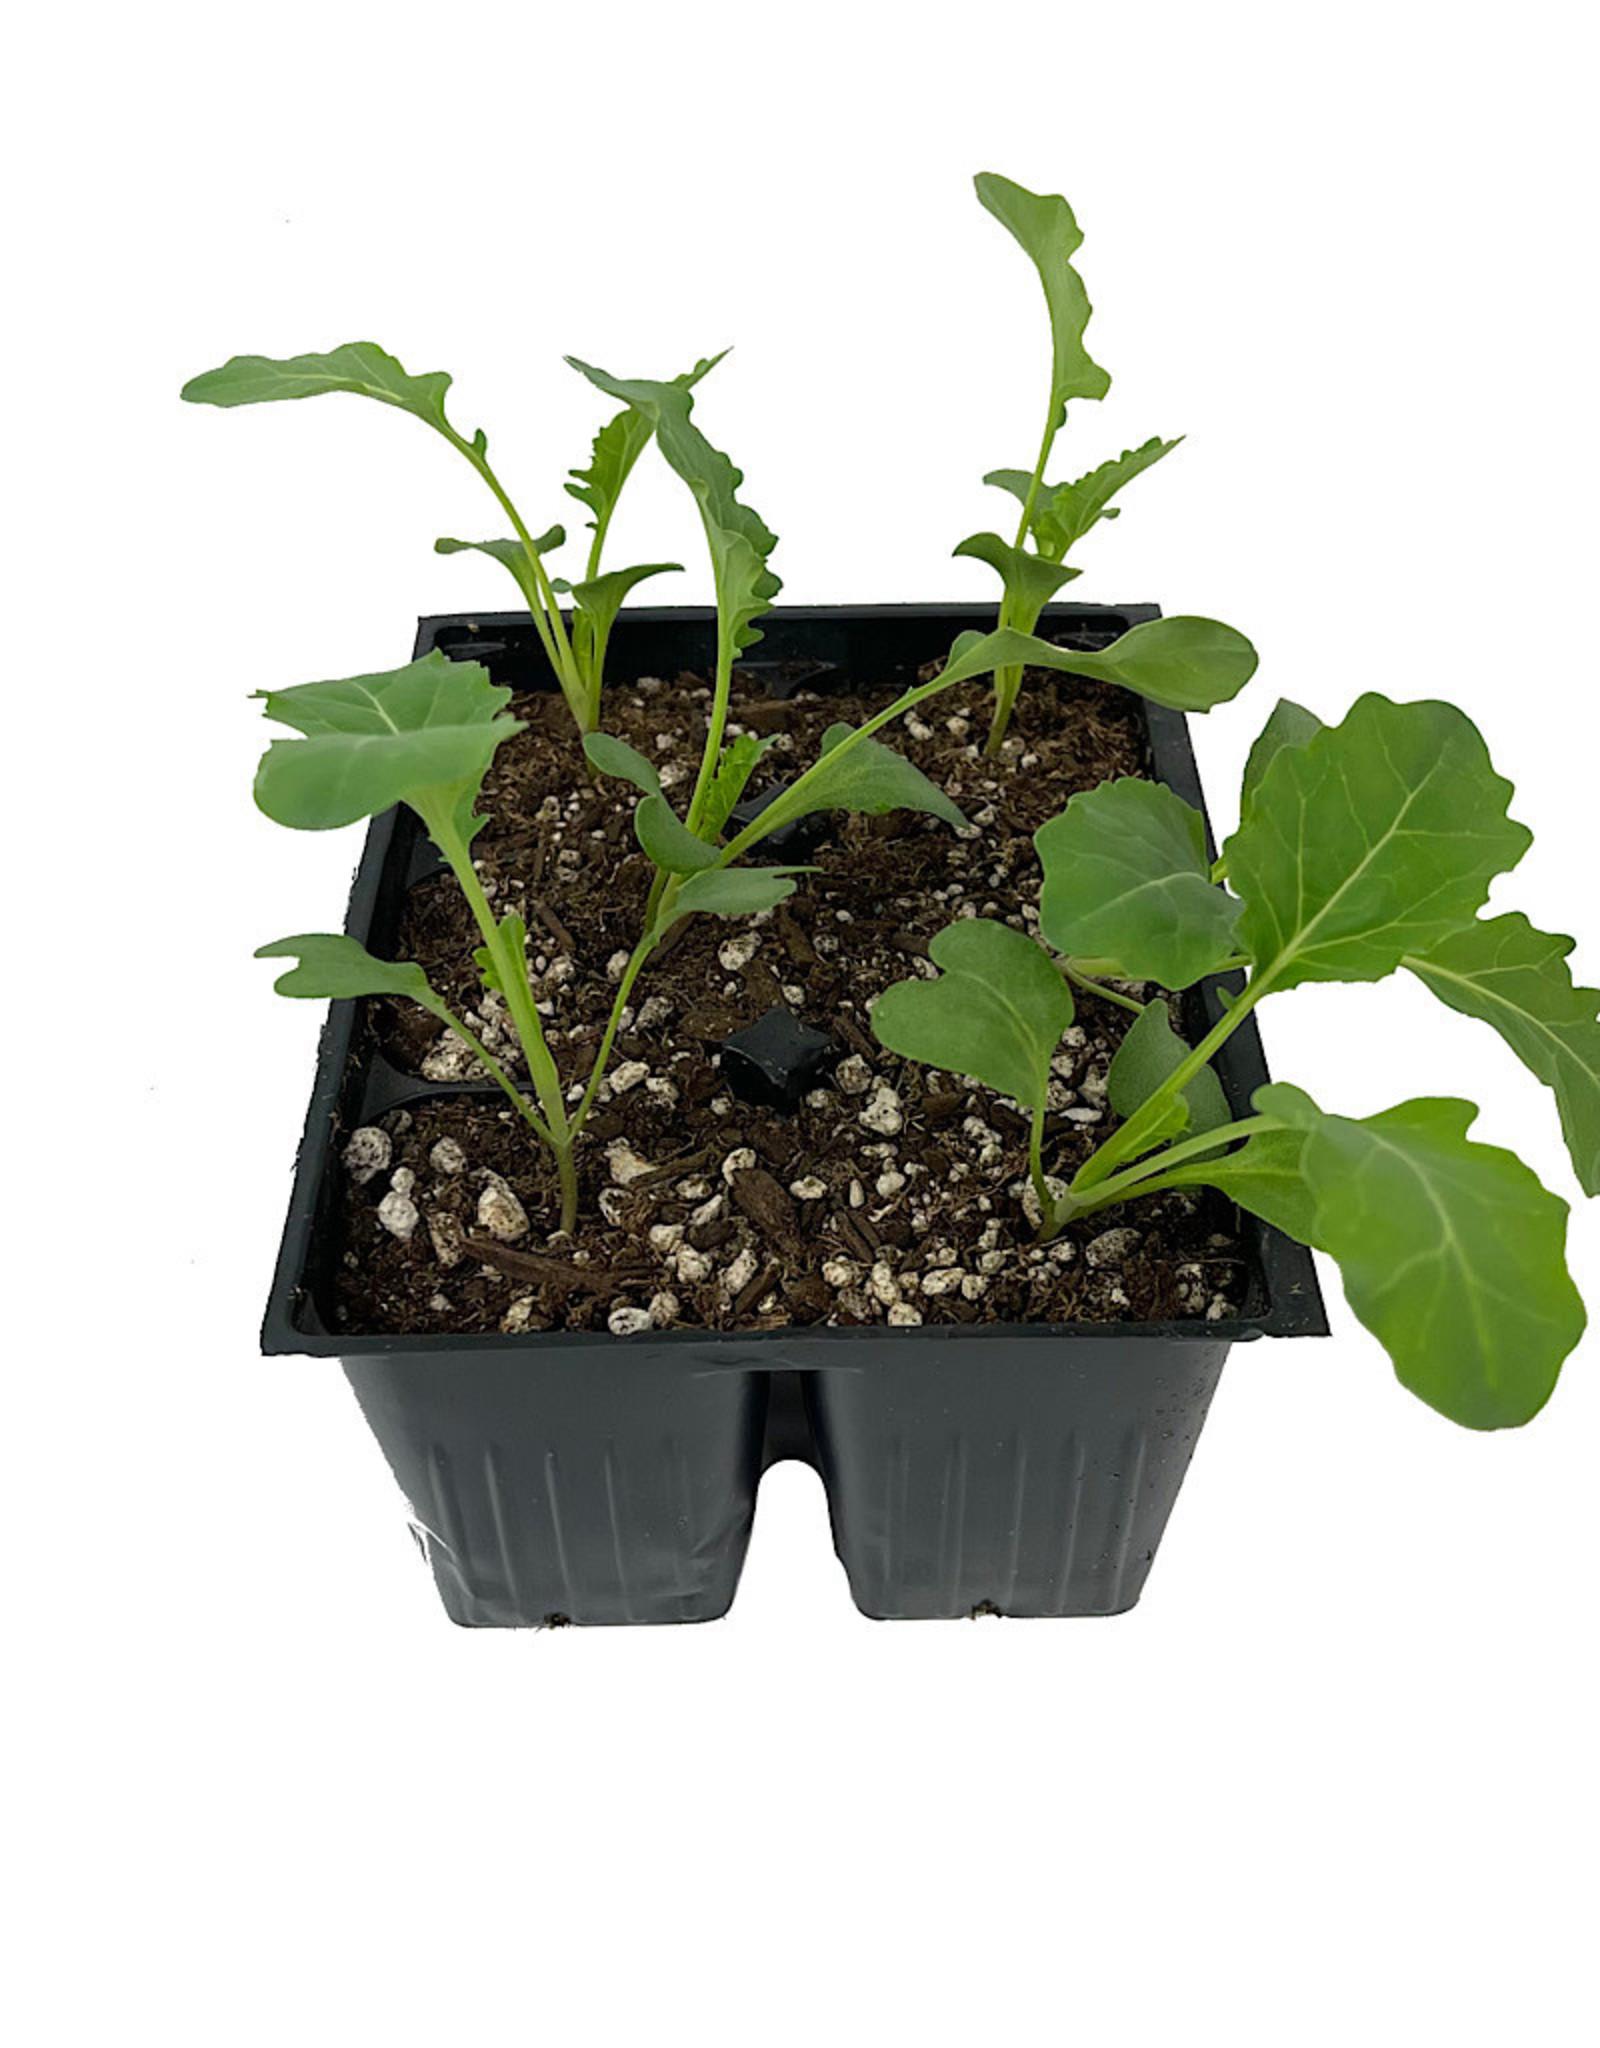 Broccoli 'Spring Blend' Jumbo Traypack